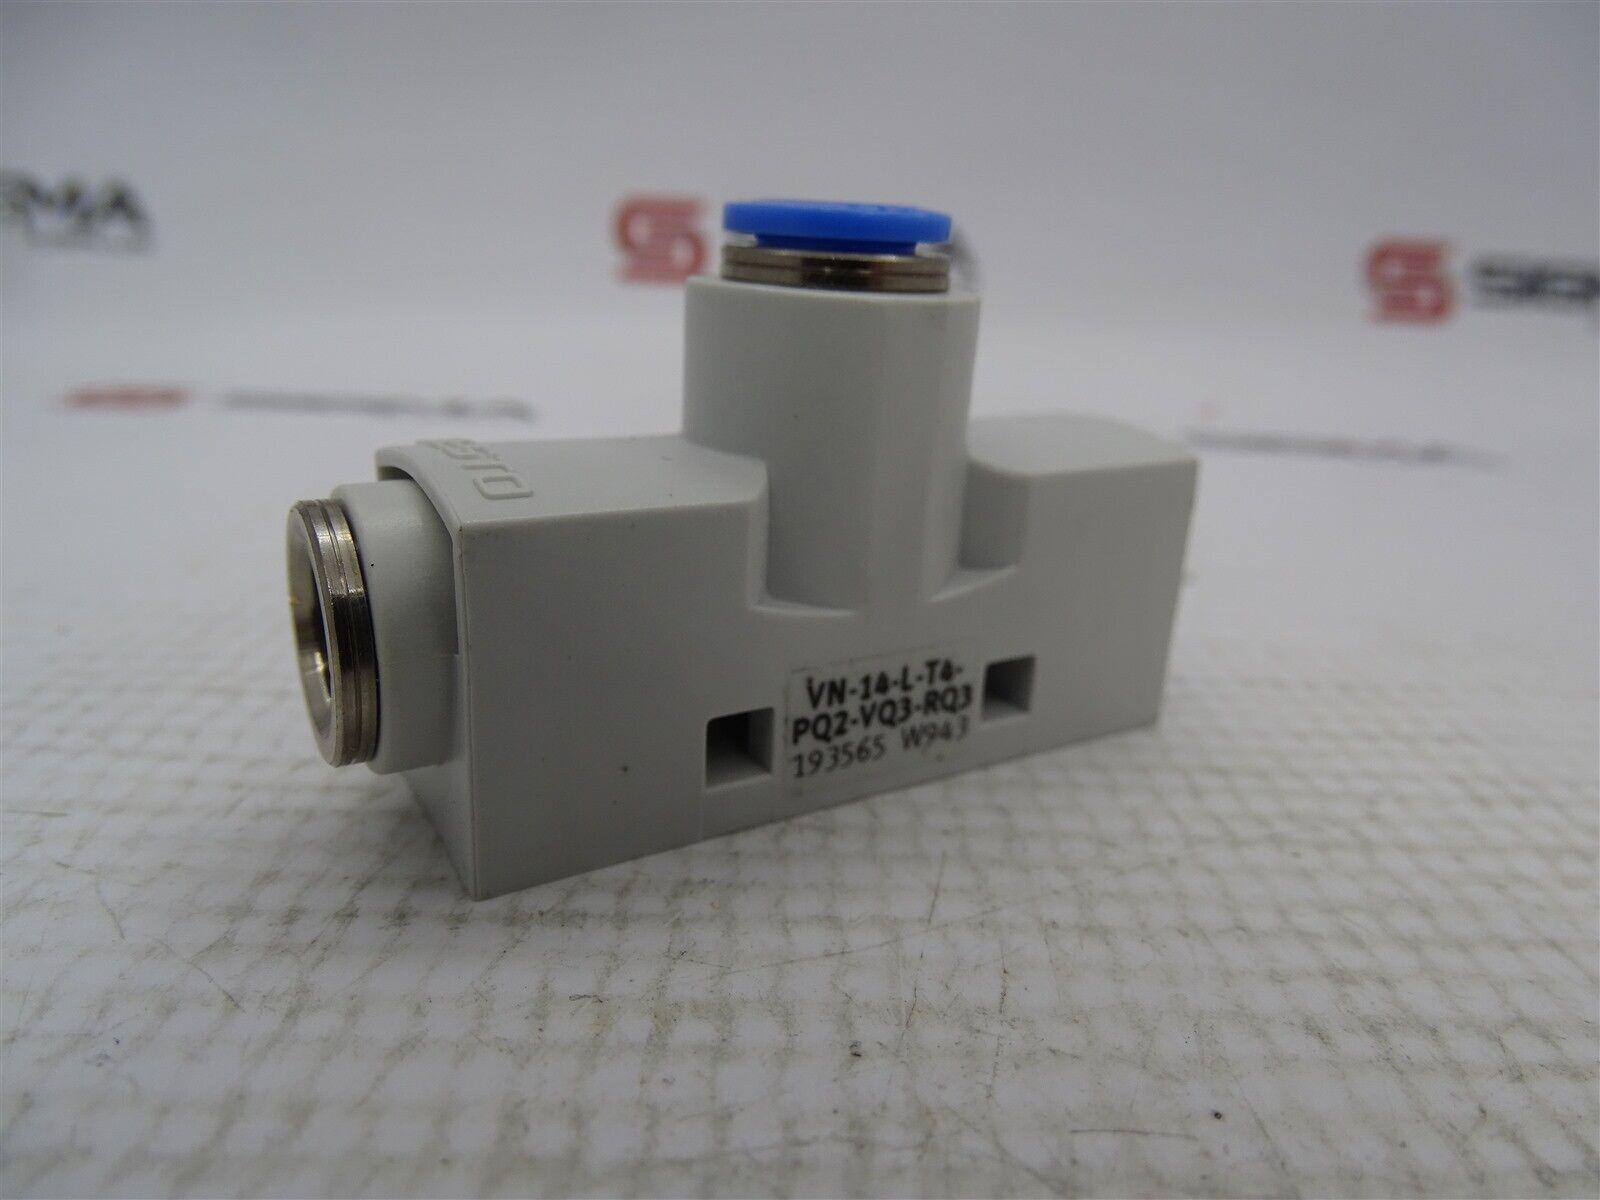 Festo VN-14-L-T4-PQ2-VQ3-RQ3 Vacuum Generator